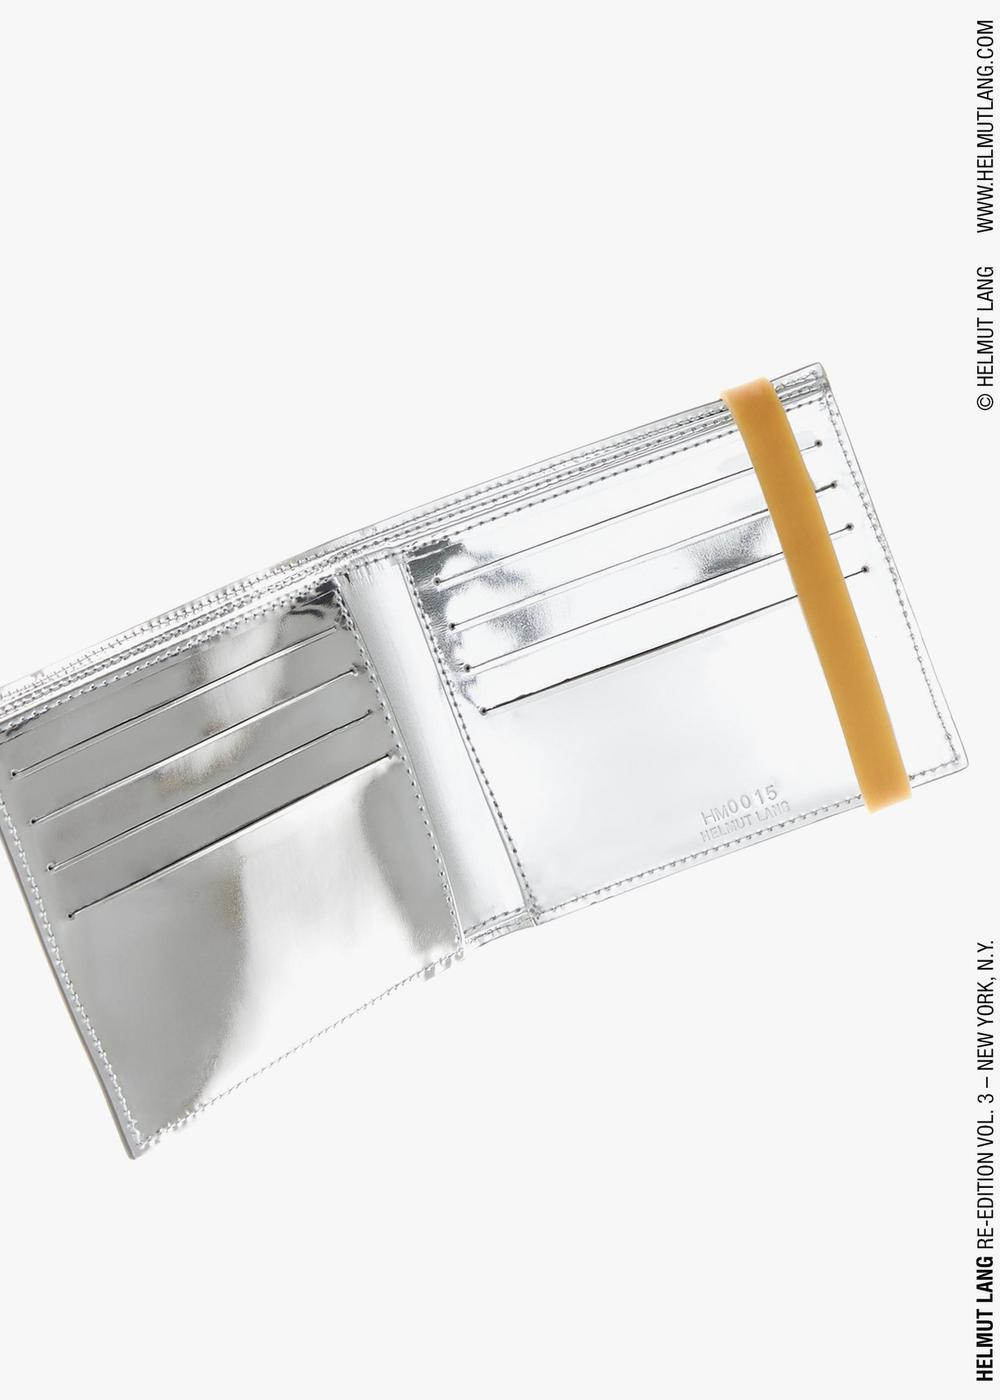 Helmut Lang product